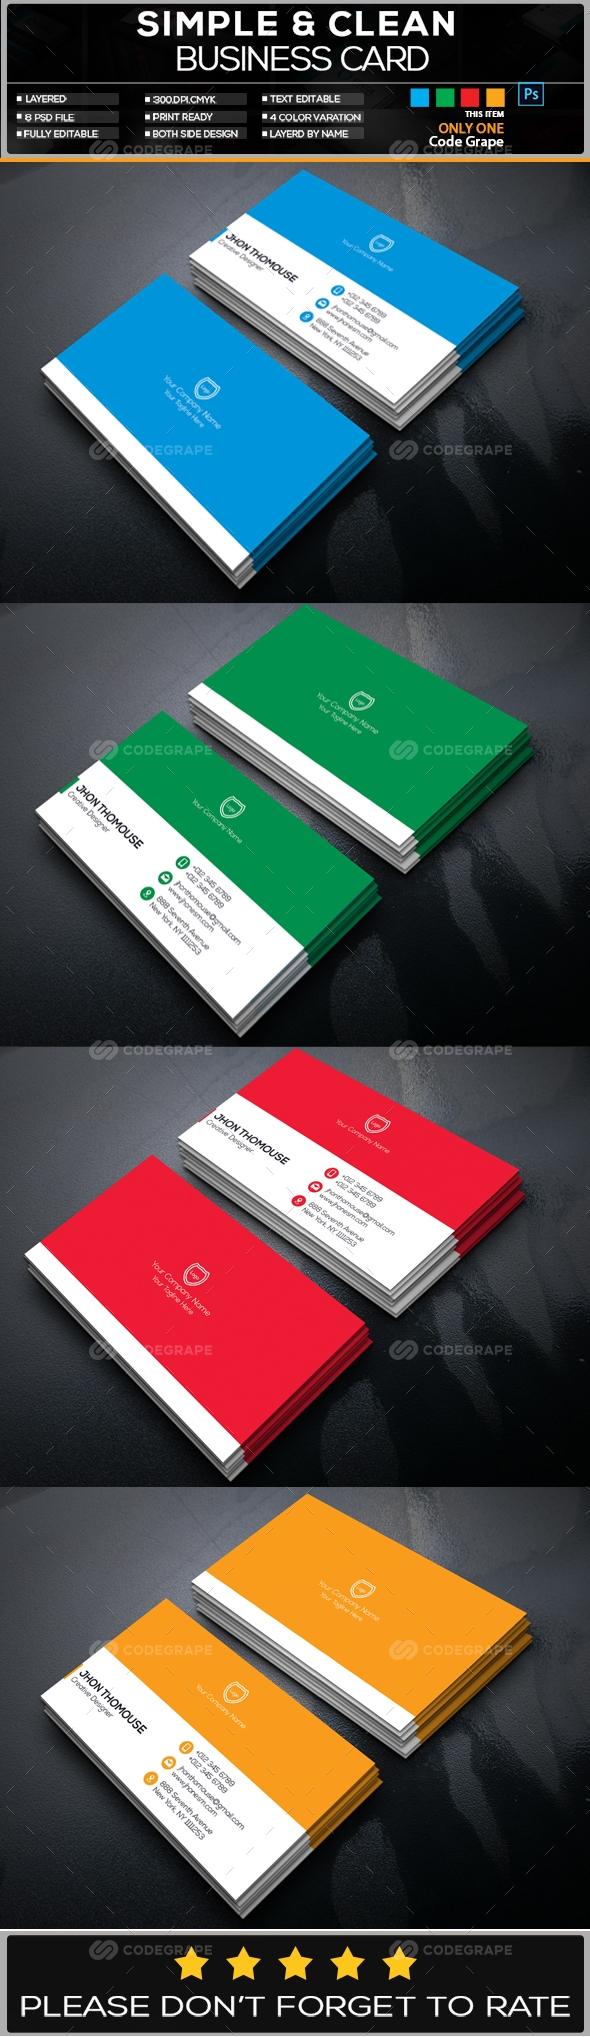 Creative Business Card Vol - 12